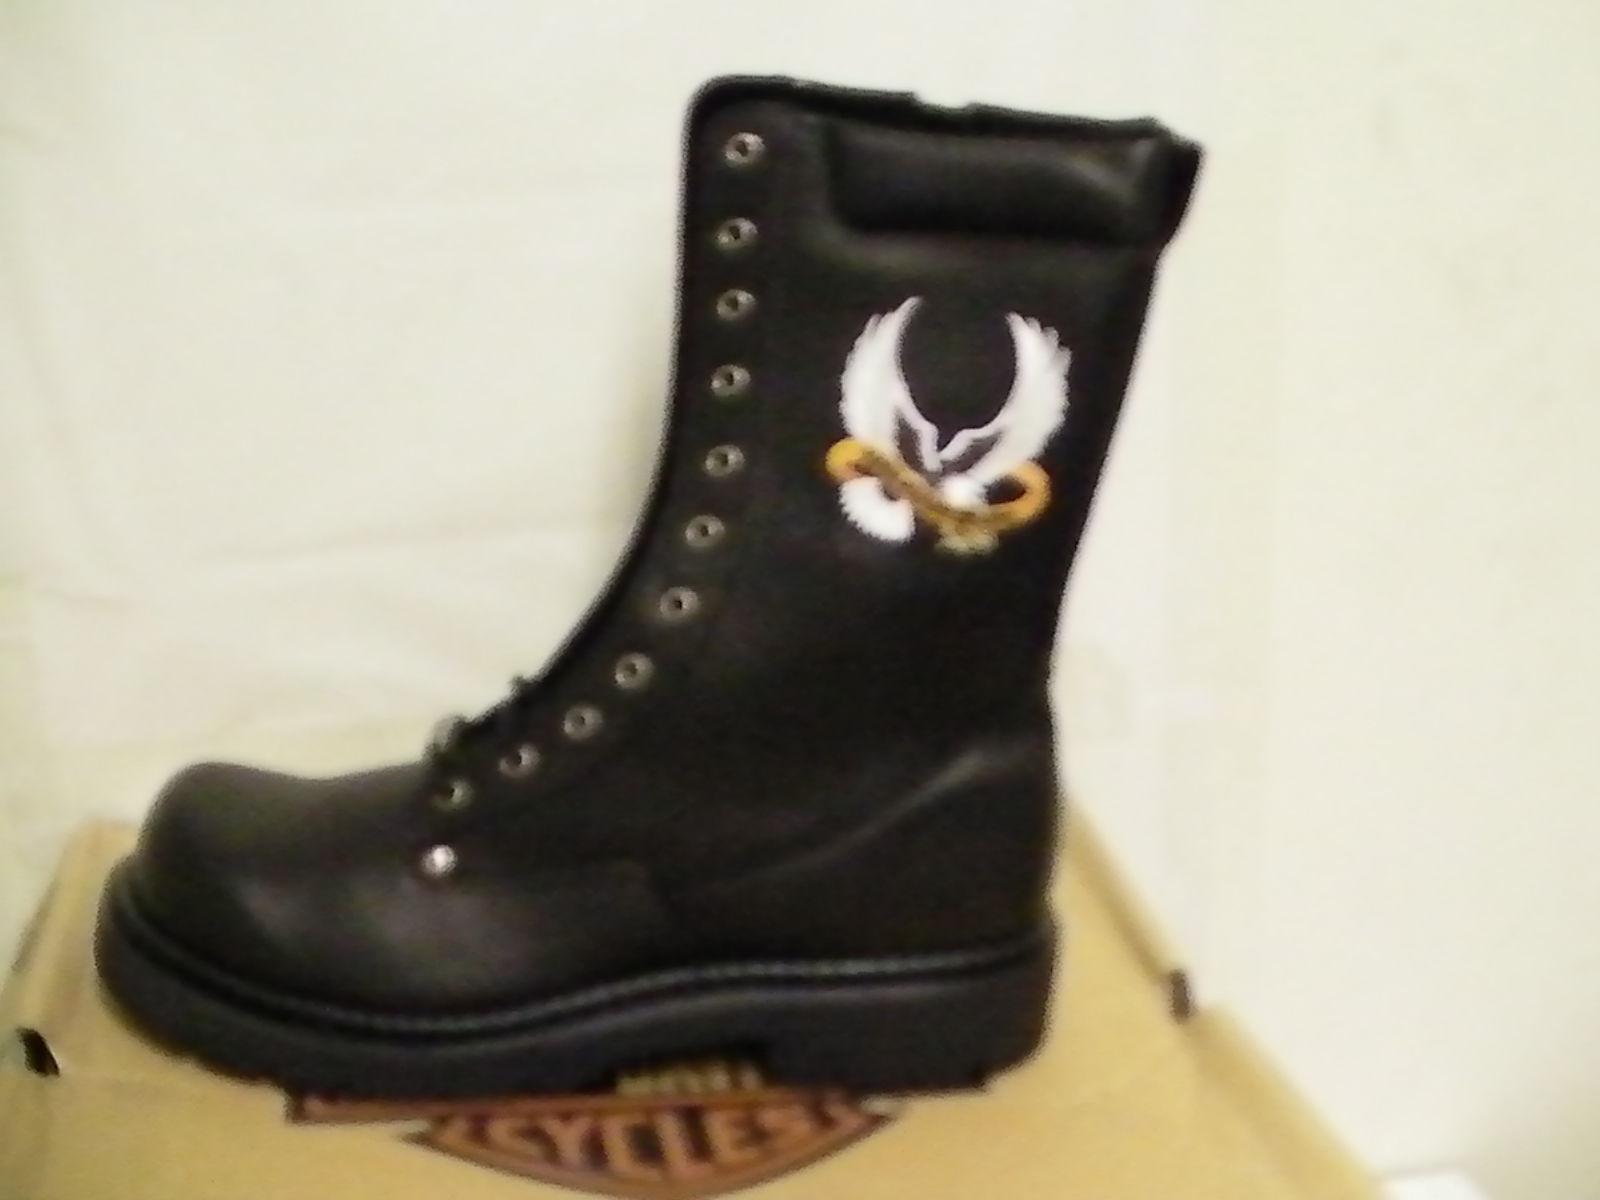 6d7aa2735460 Harley davidson boots free wheeler 10